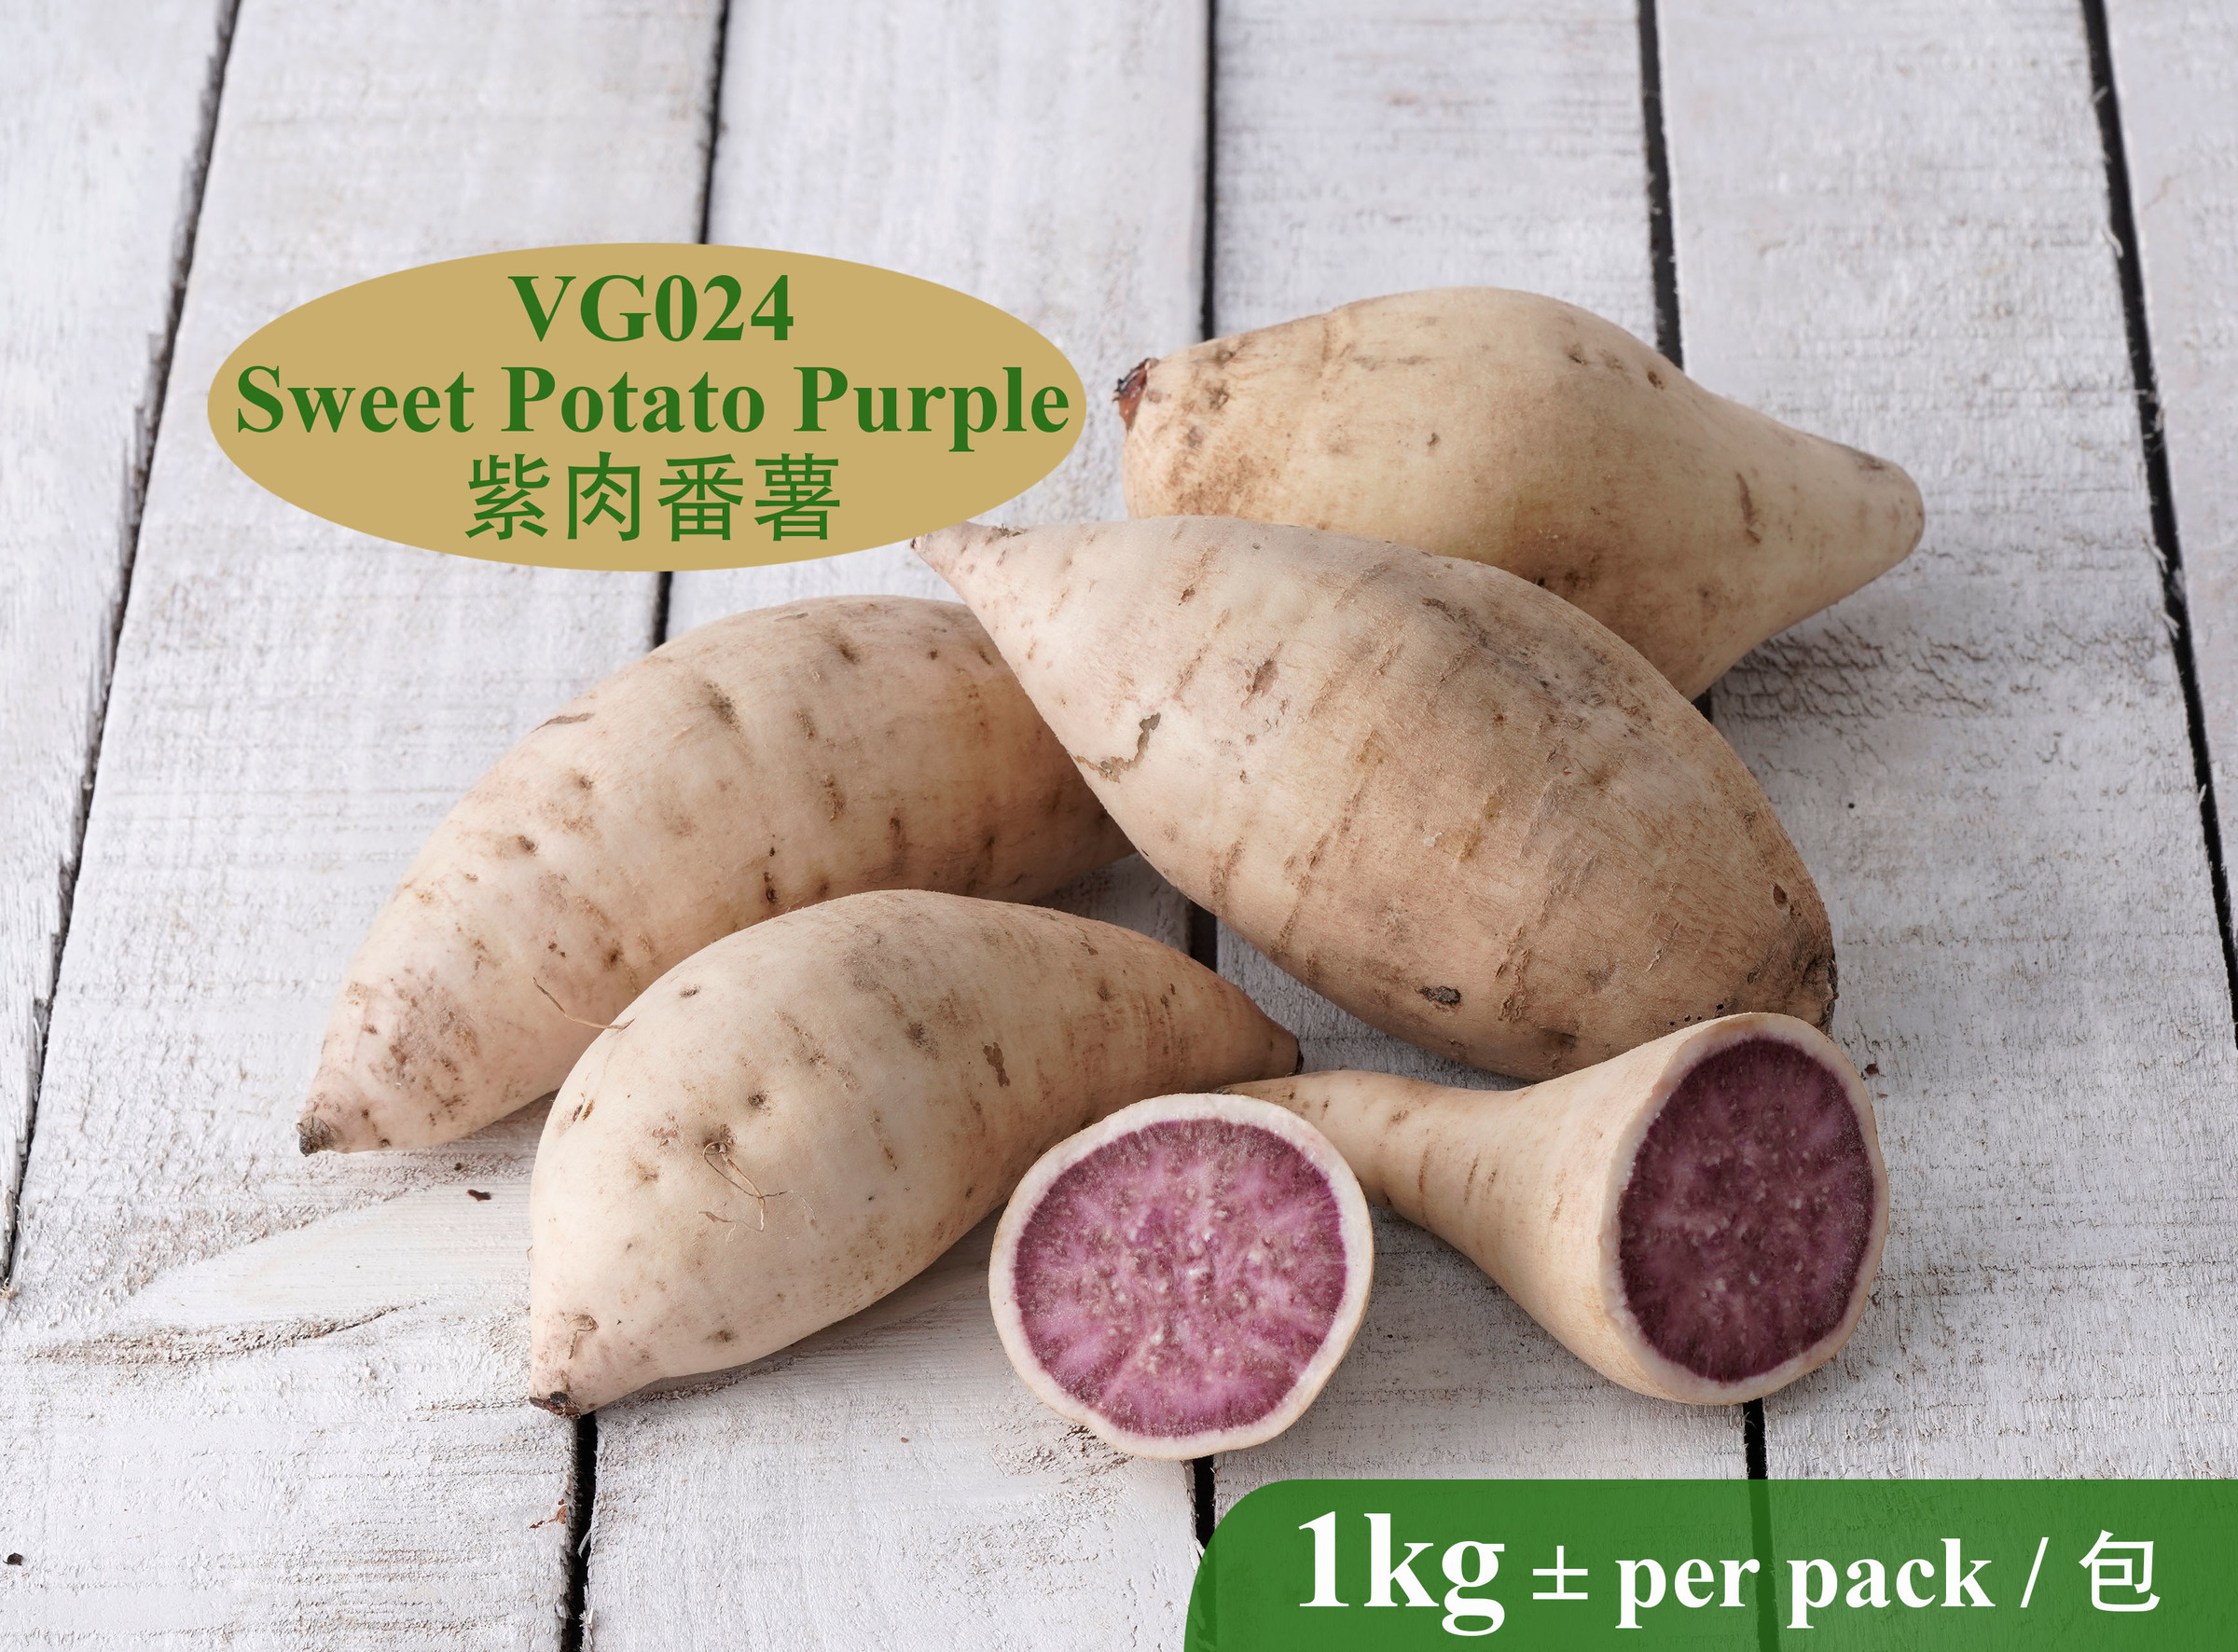 VG024 Sweet Potato Purple-RM12.00 per kg.jpg